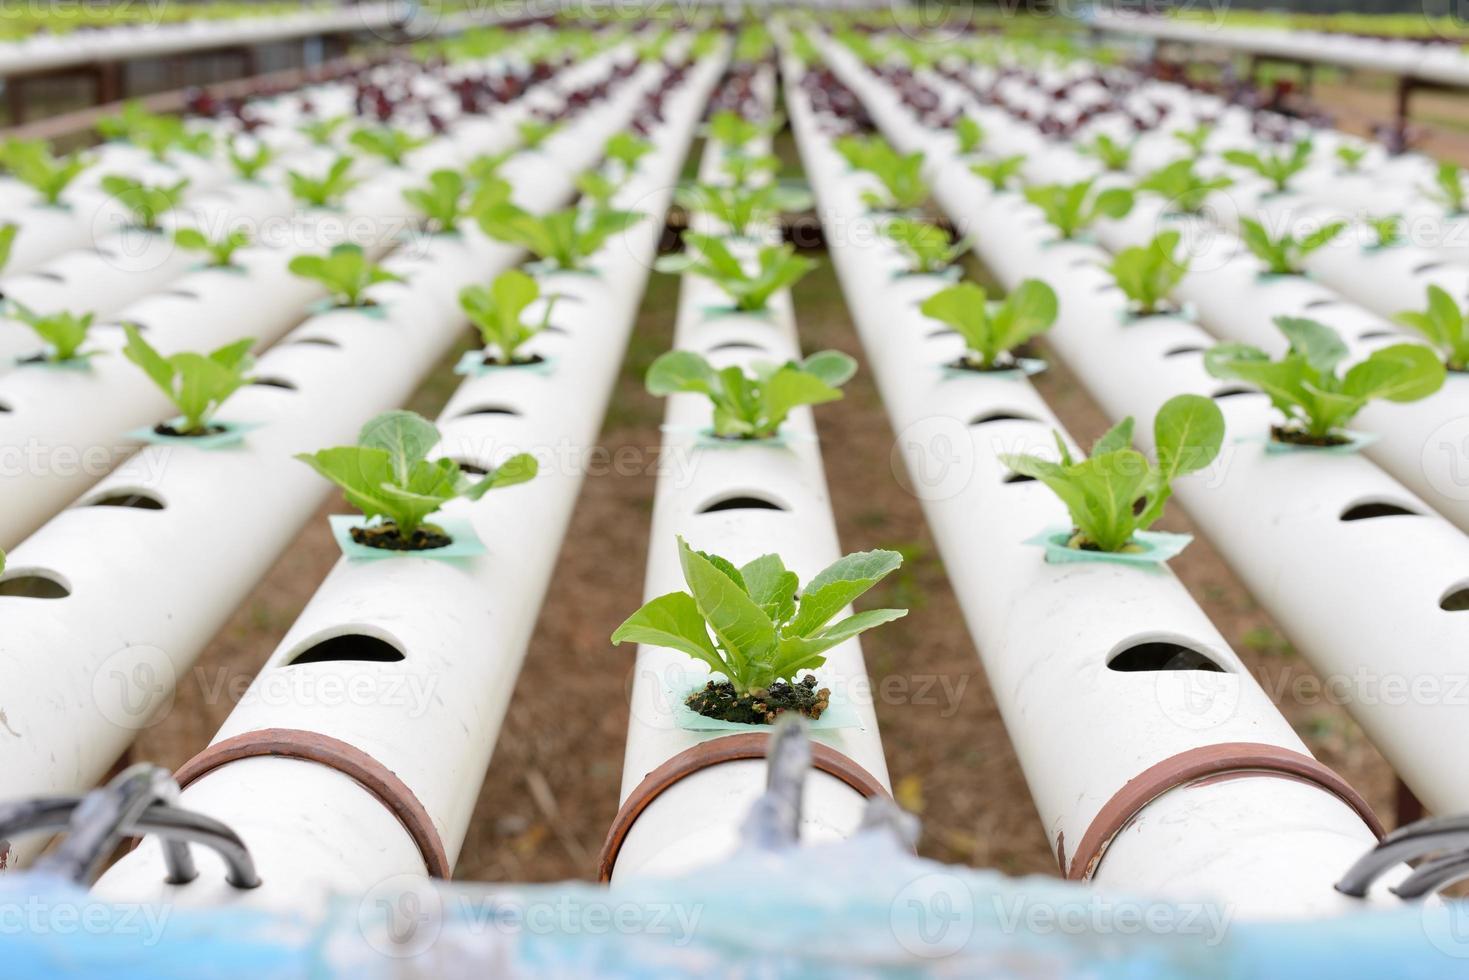 hydrocultuur groenteplantage foto